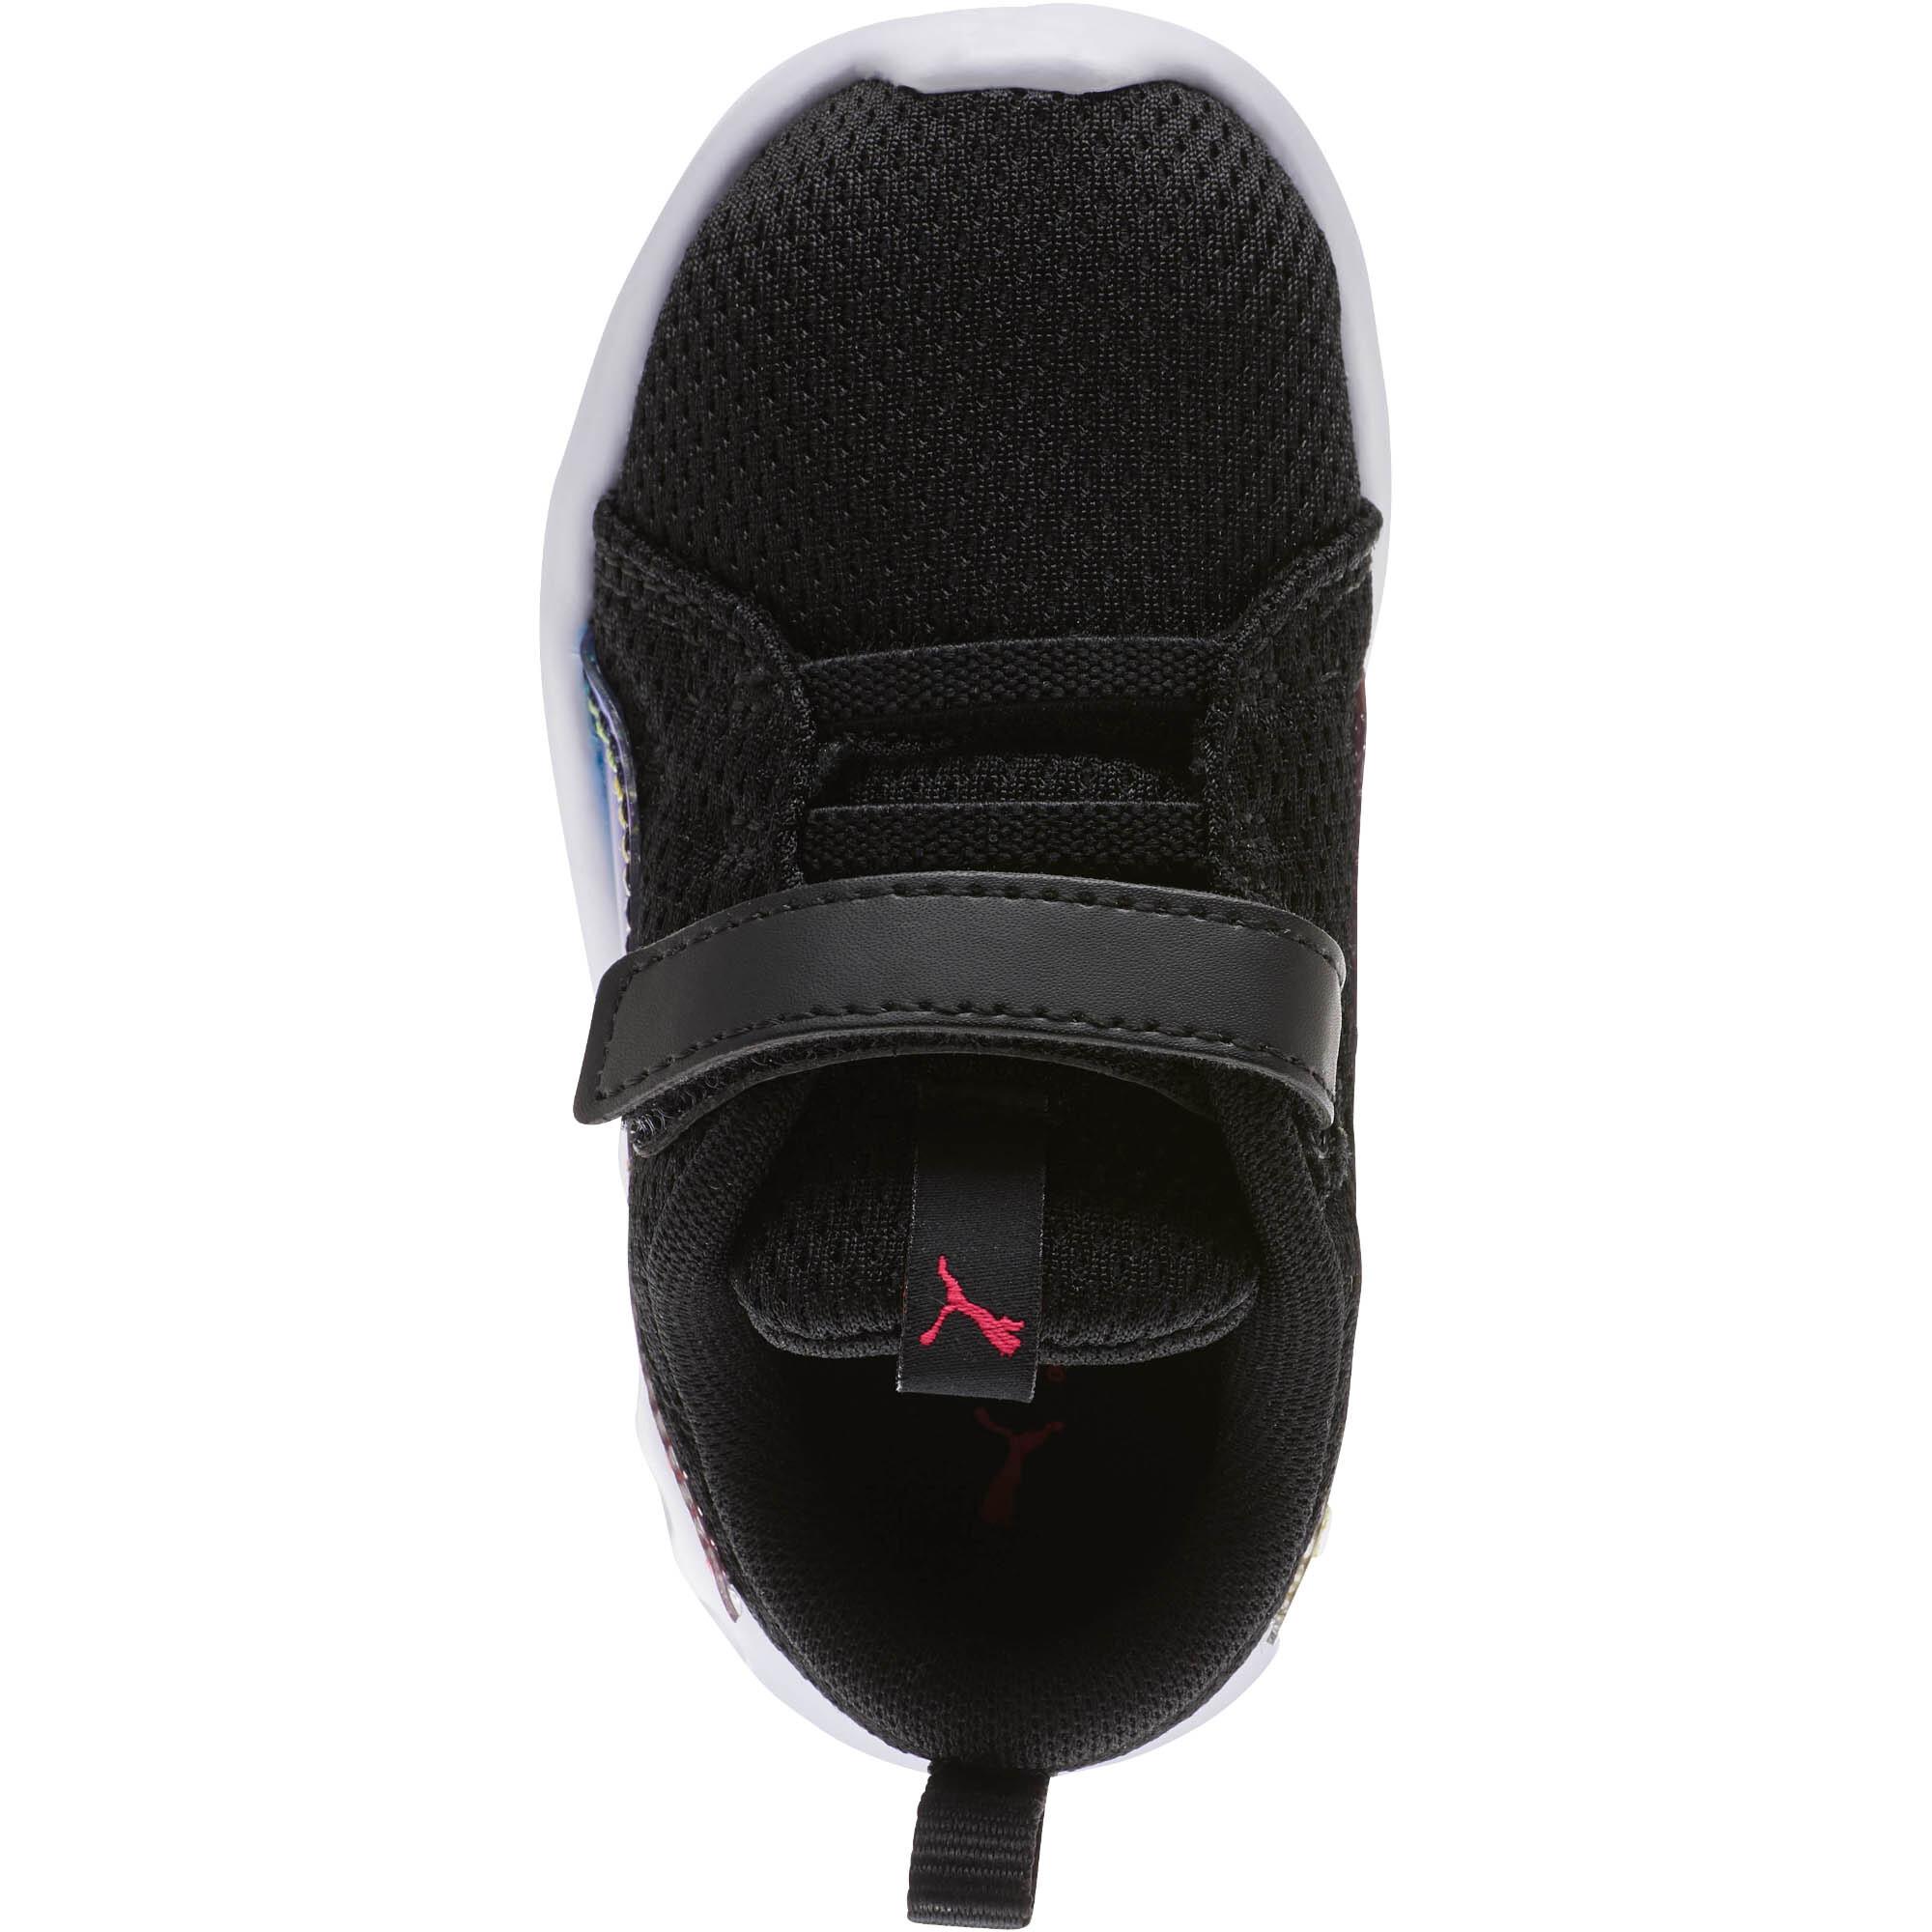 PUMA-Carson-2-Iridescent-Toddler-Shoes-Girls-Shoe-Kids thumbnail 6